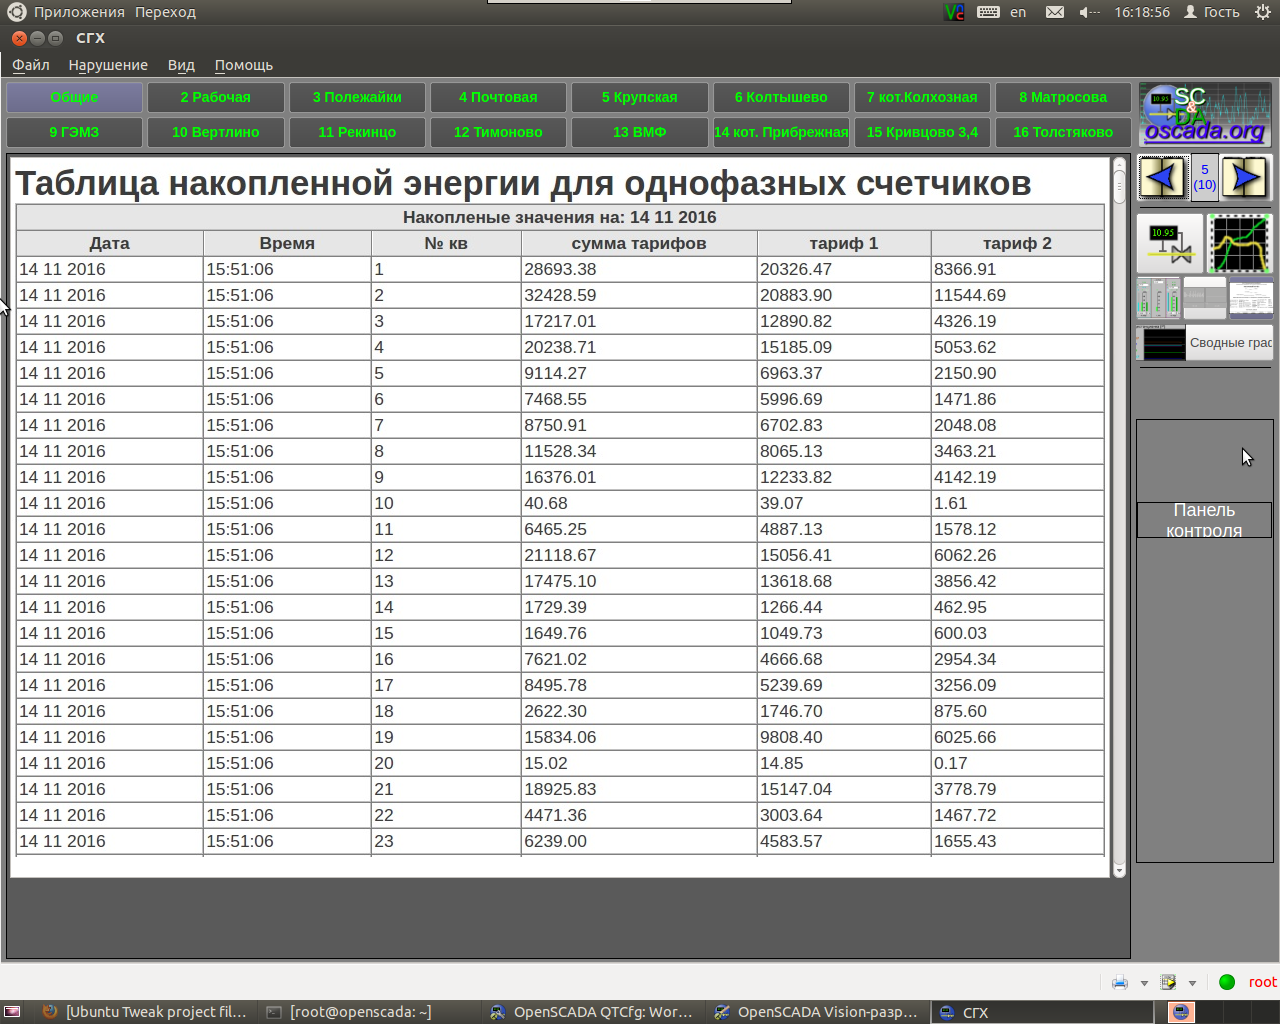 Пишем протоколы счетчиков Меркурий 230 и Меркурий 200 для OpenSCADA - 28